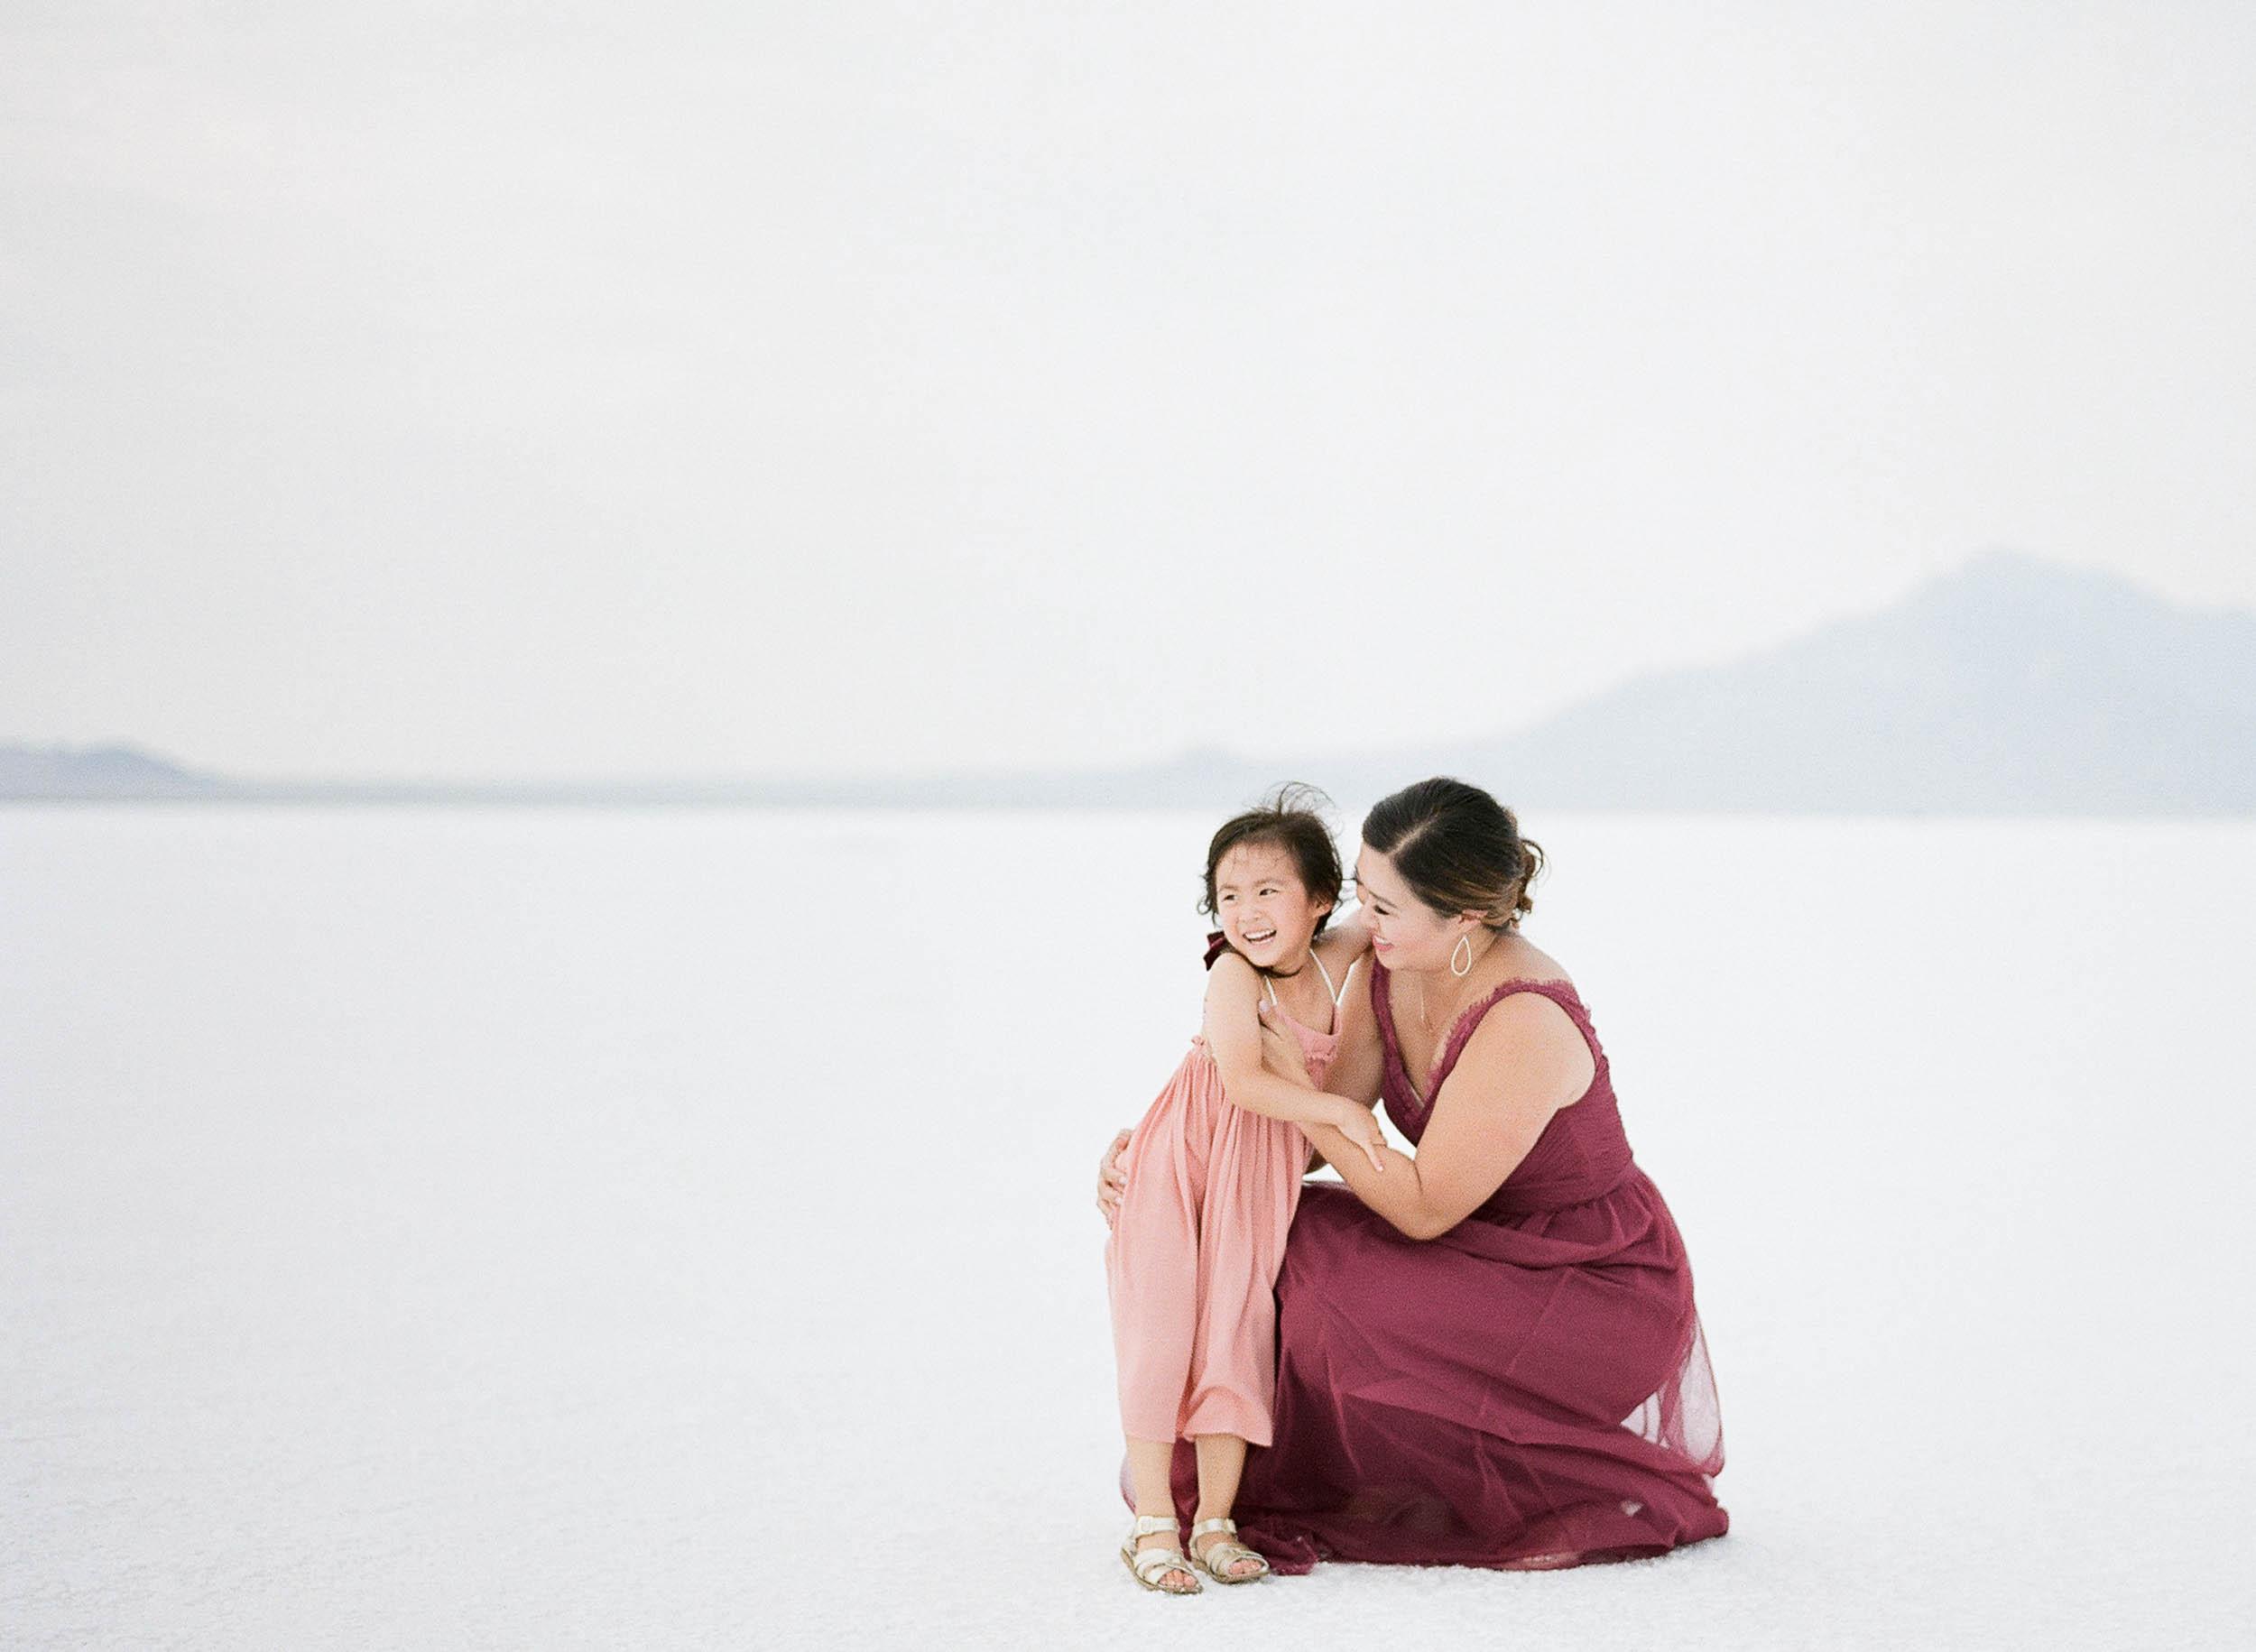 070918_Sandy A La Mode_Family_Utah Salt Flats_Buena Lane Photography_F400_37.jpg